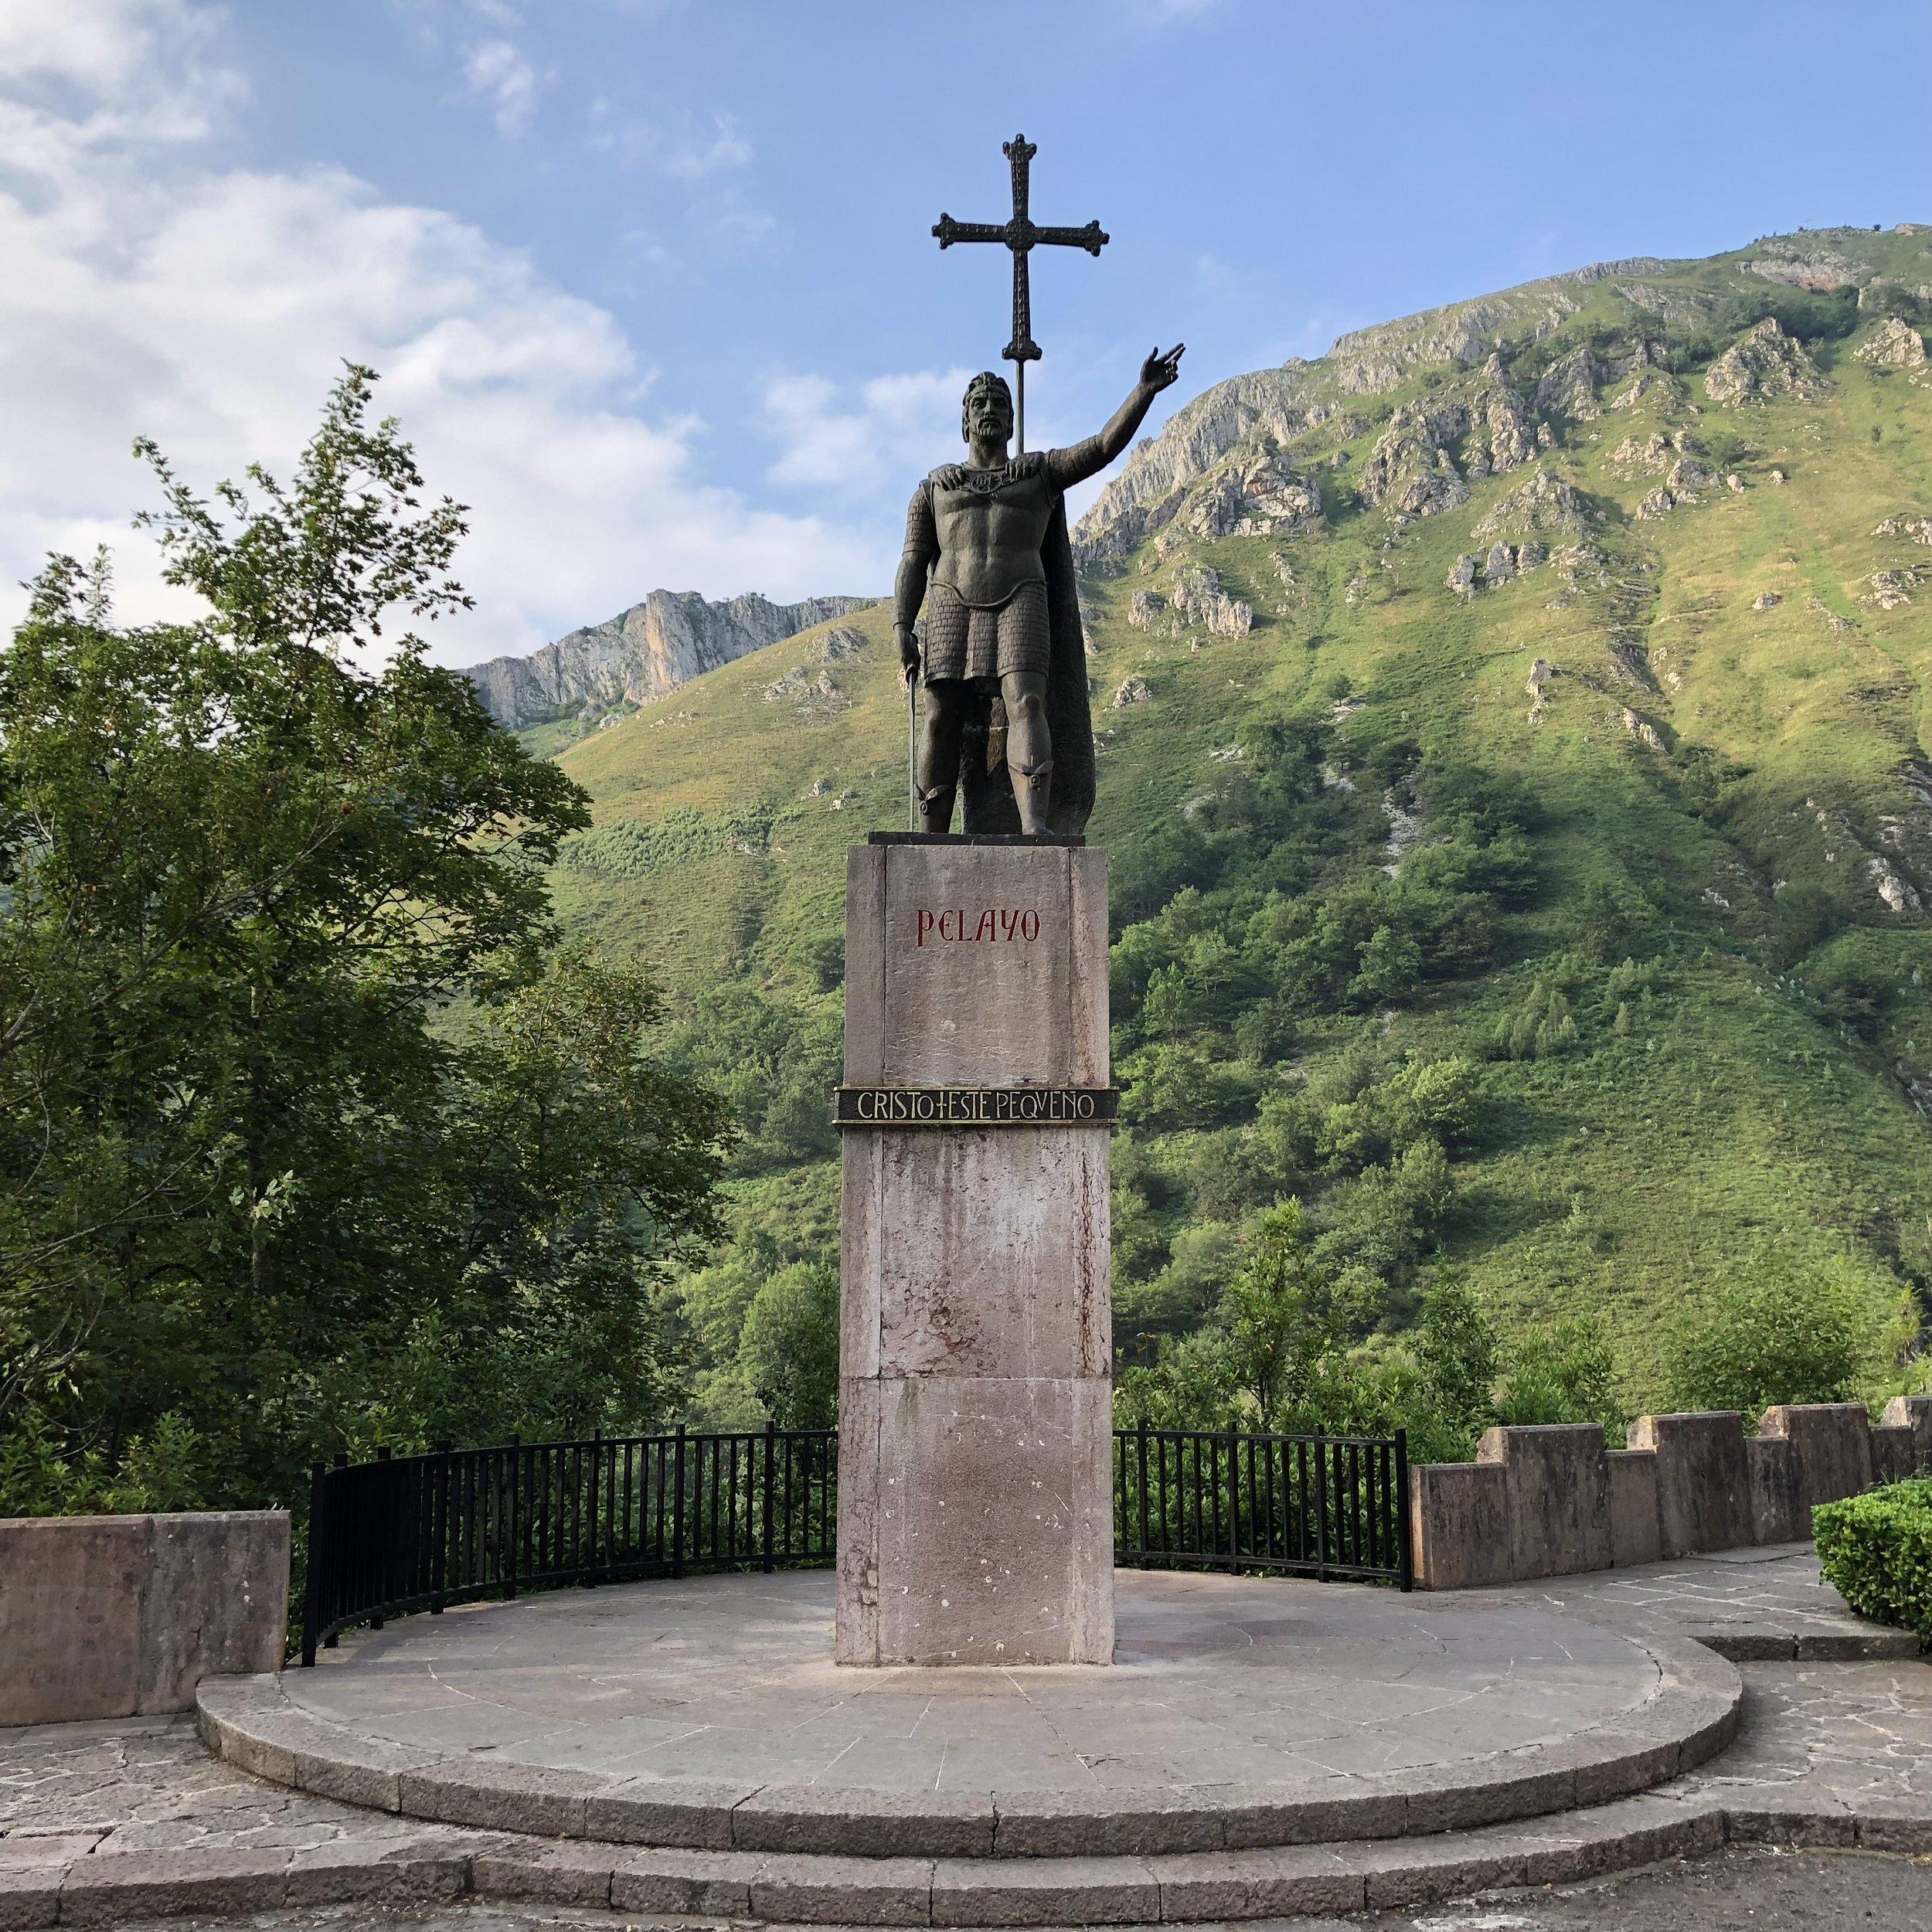 Statue of Don Pelayo, first King of Asturias.